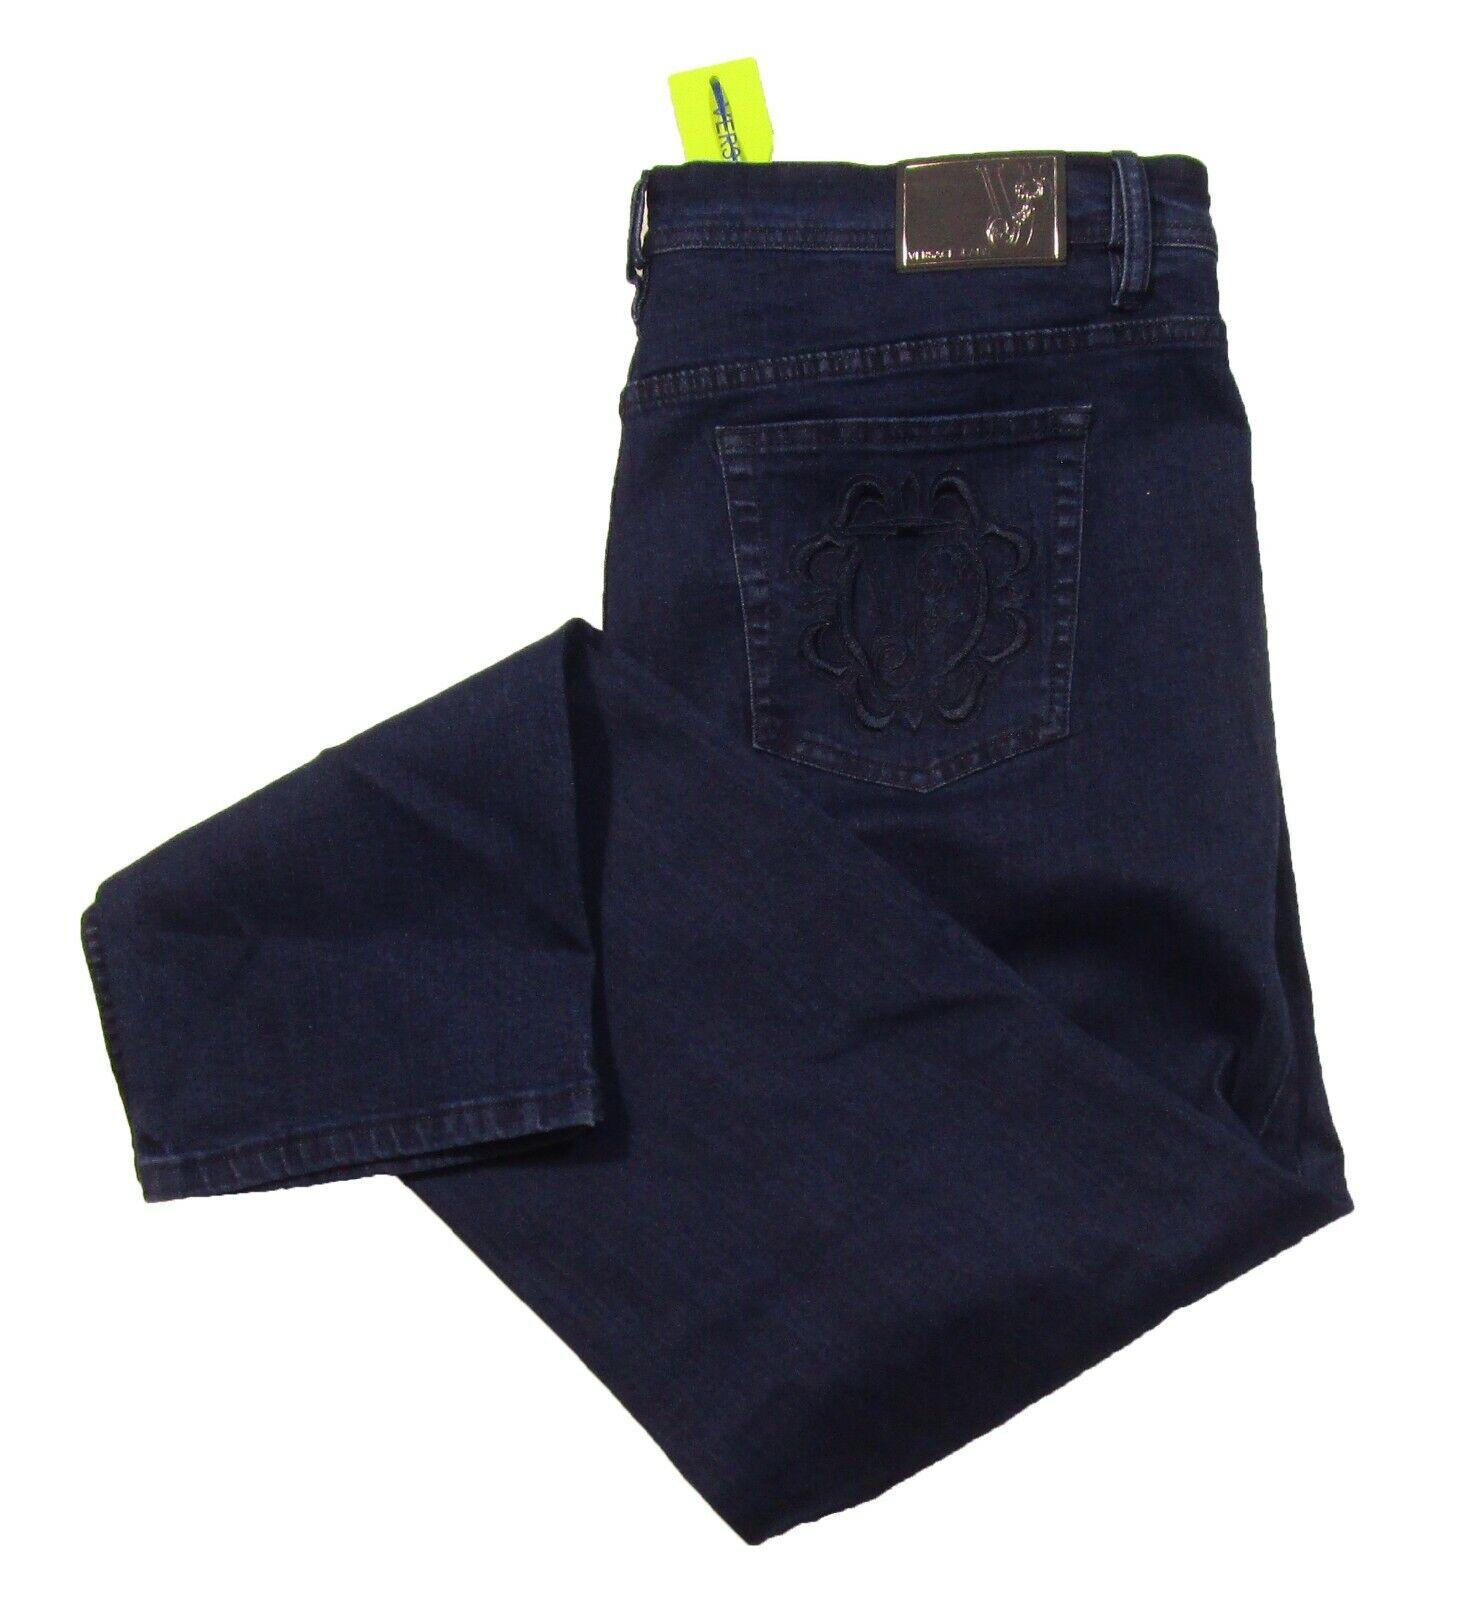 Versace Jeans Men's Dark Wash Slim Fit Denim Jeans